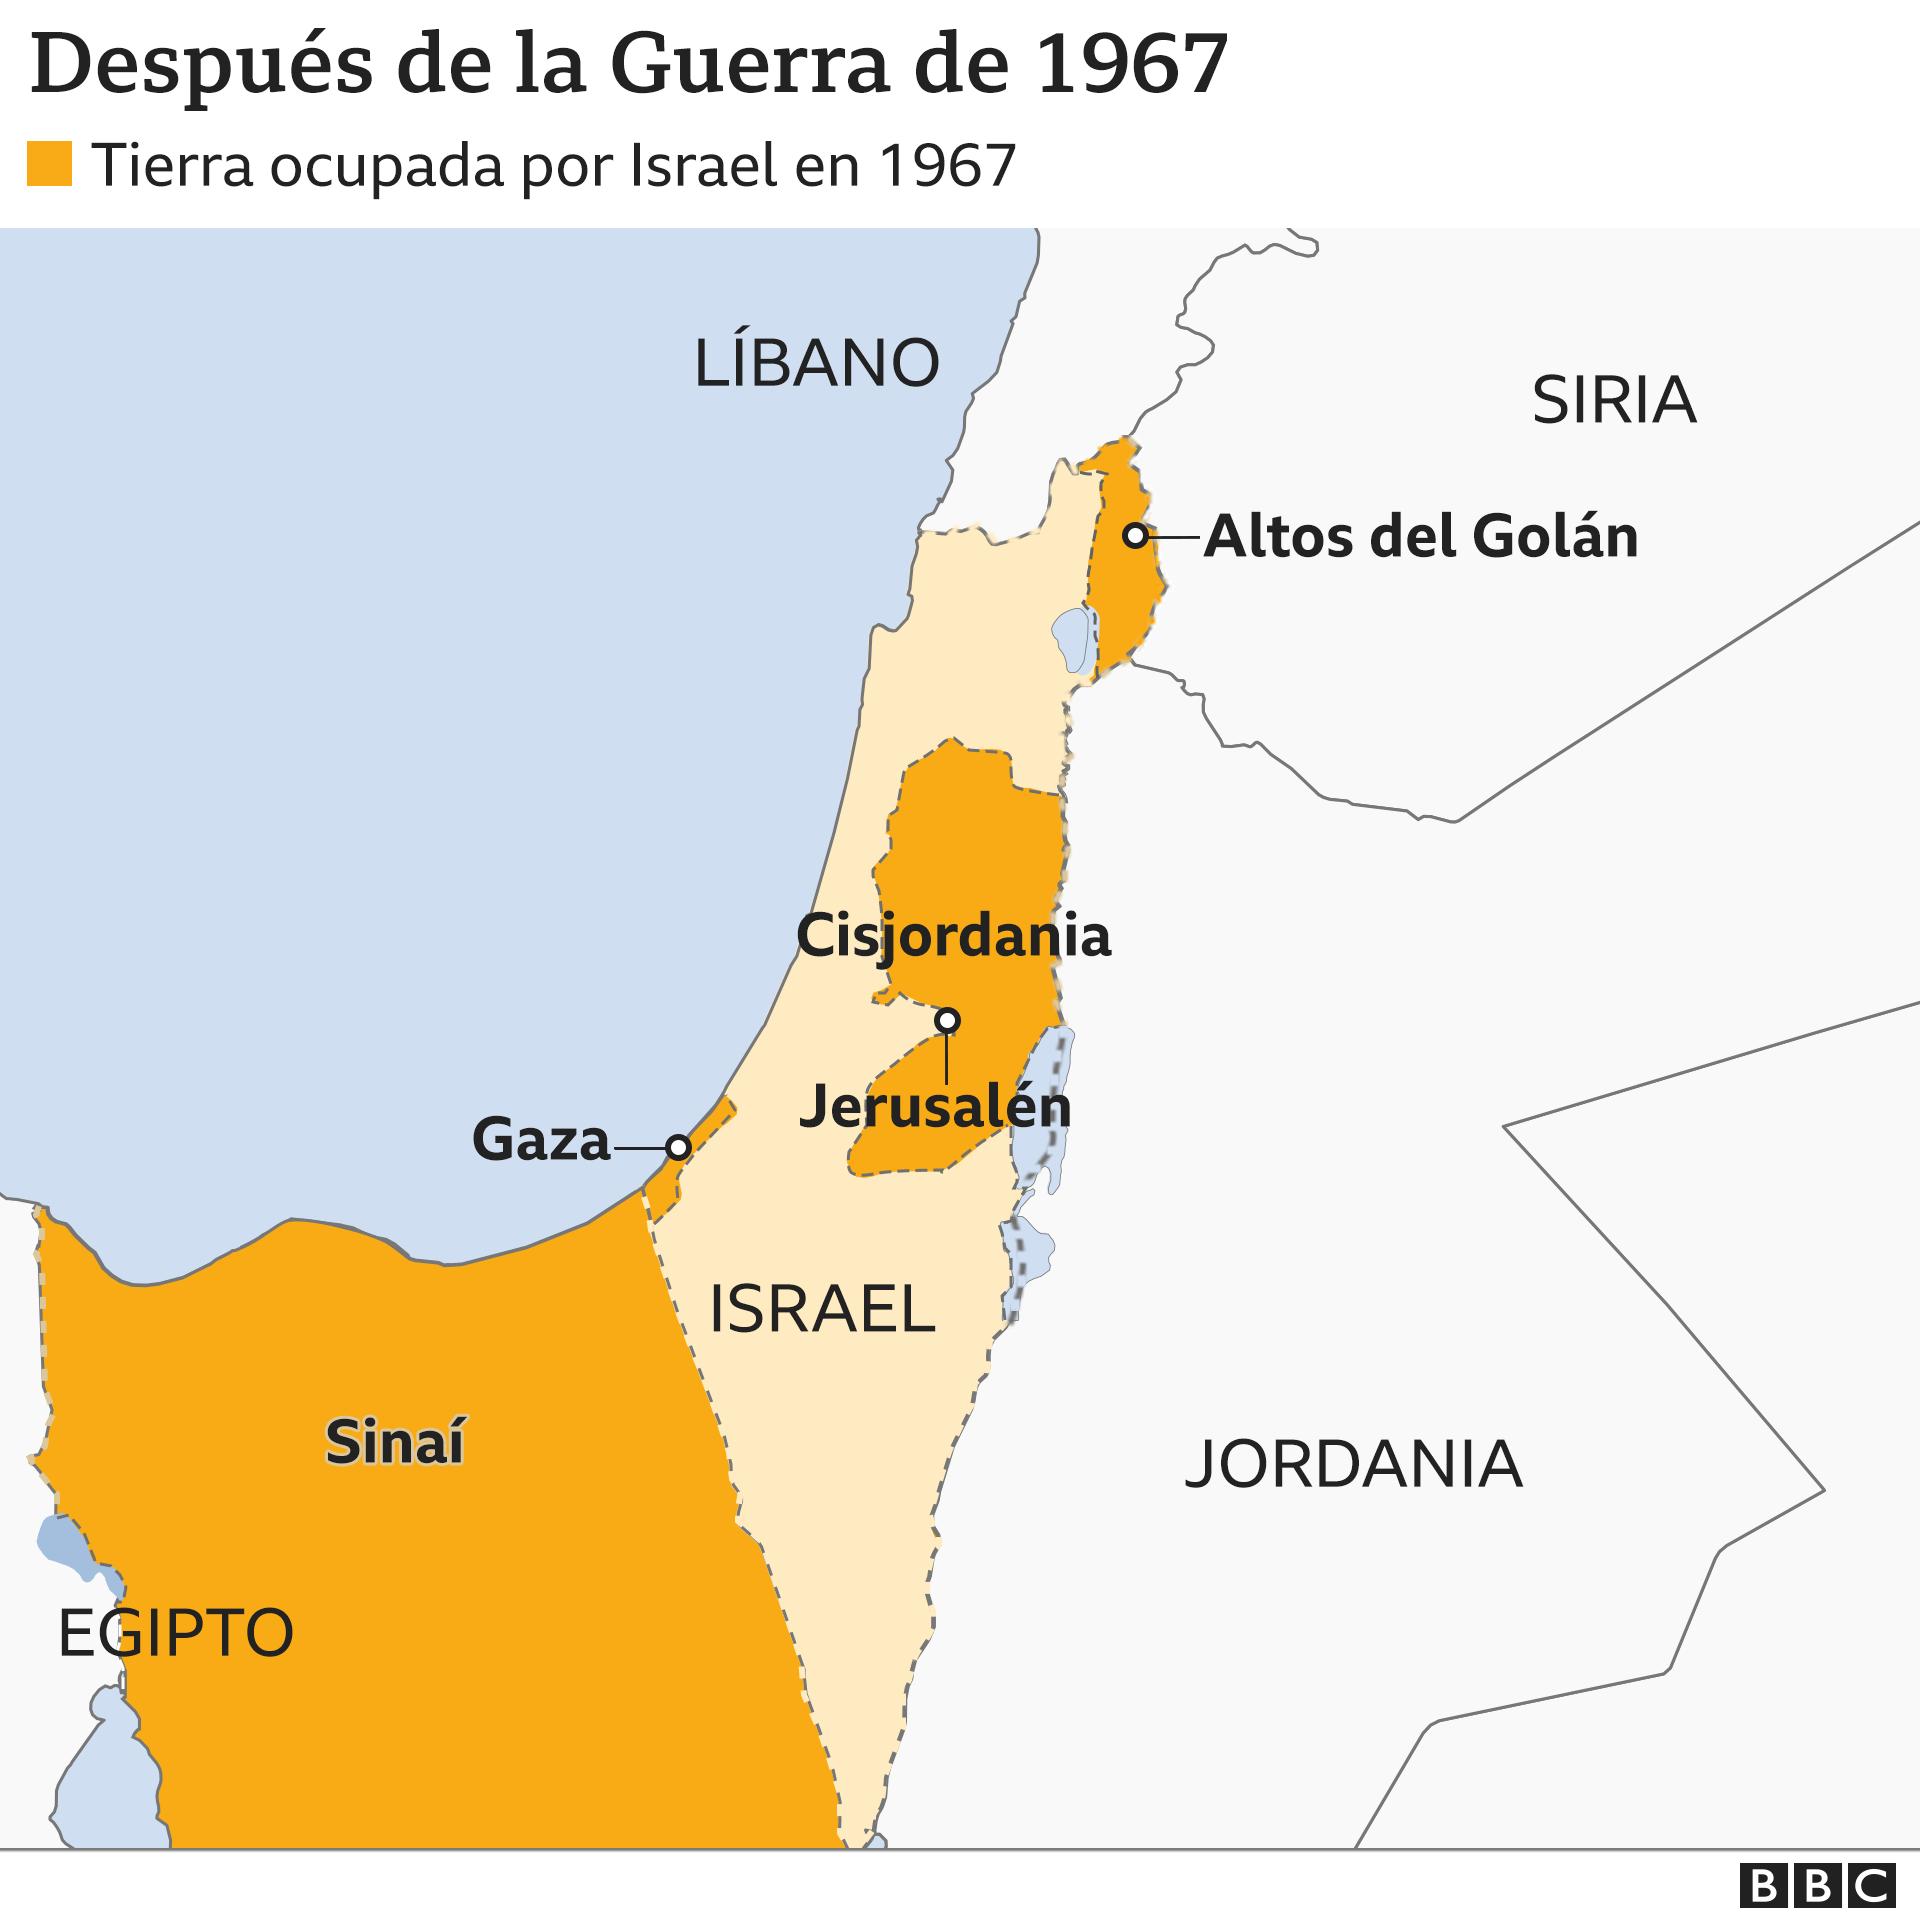 Mapa 4: después de la guerra de 1967